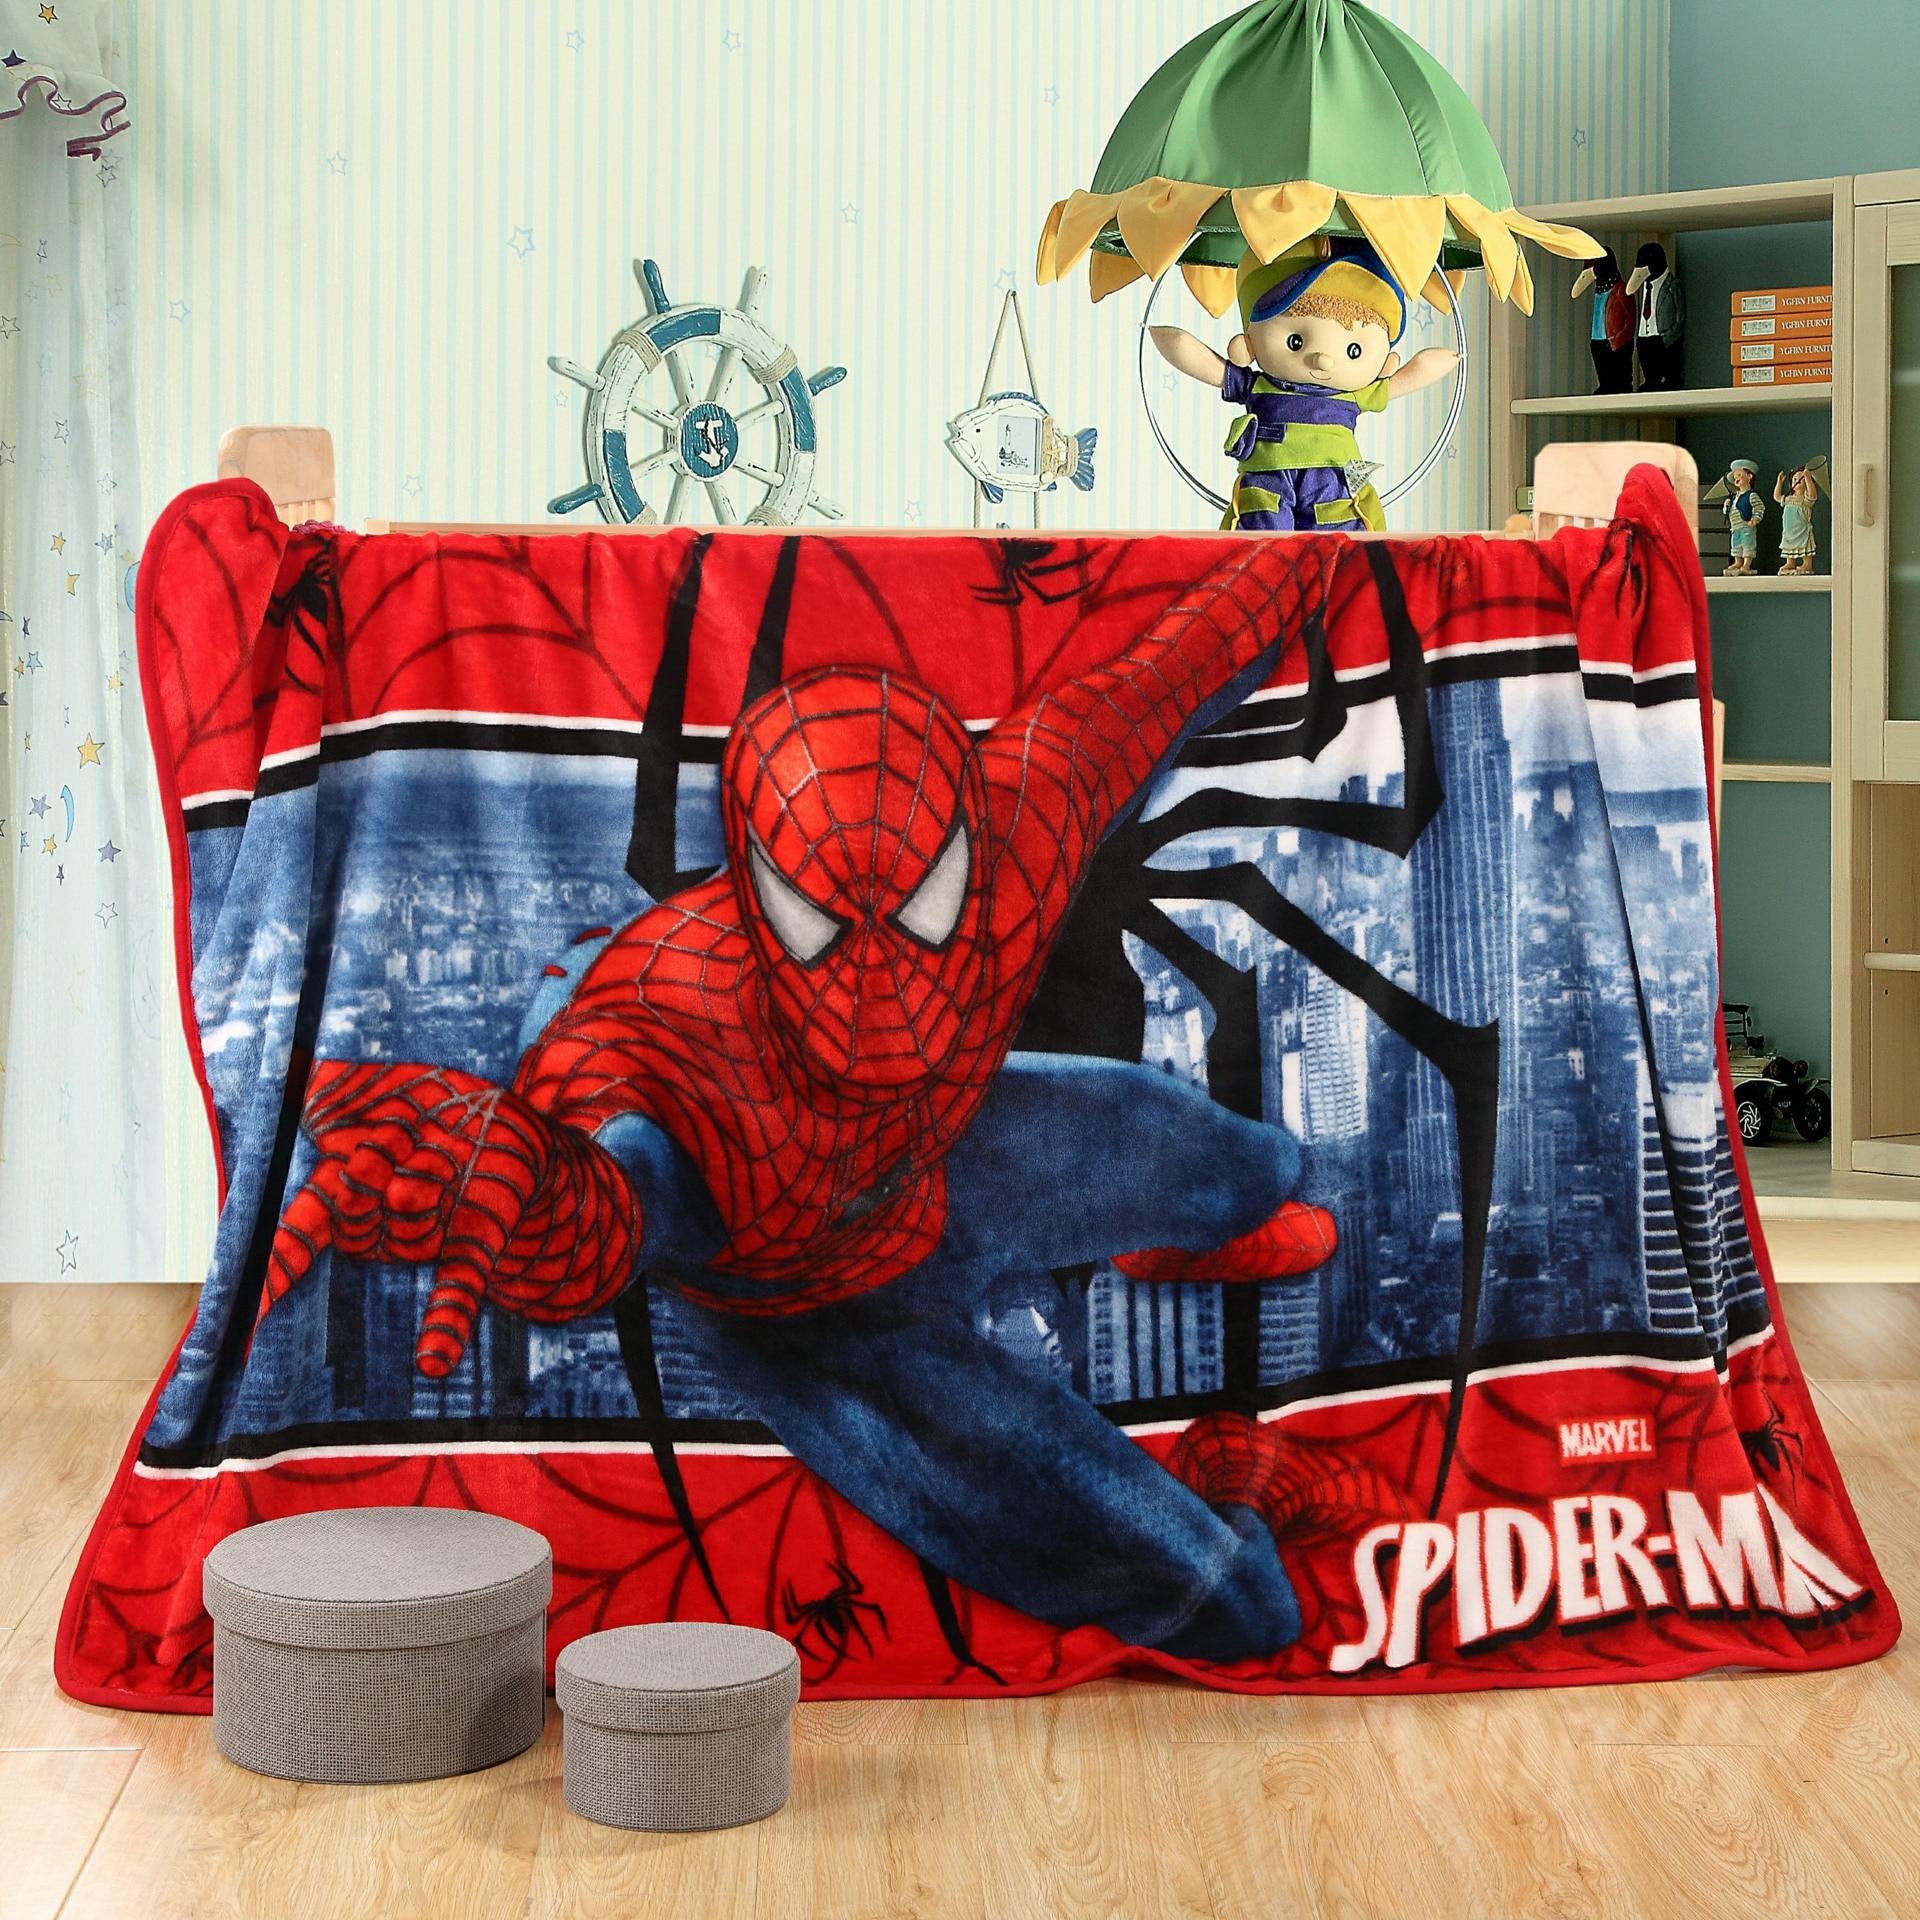 Super Spider-man Warm Blanket New Cartoon Fleece Blanket 100x140cm Size Soft Blanket on Bed Coral Fleece Warm Throw Blankets